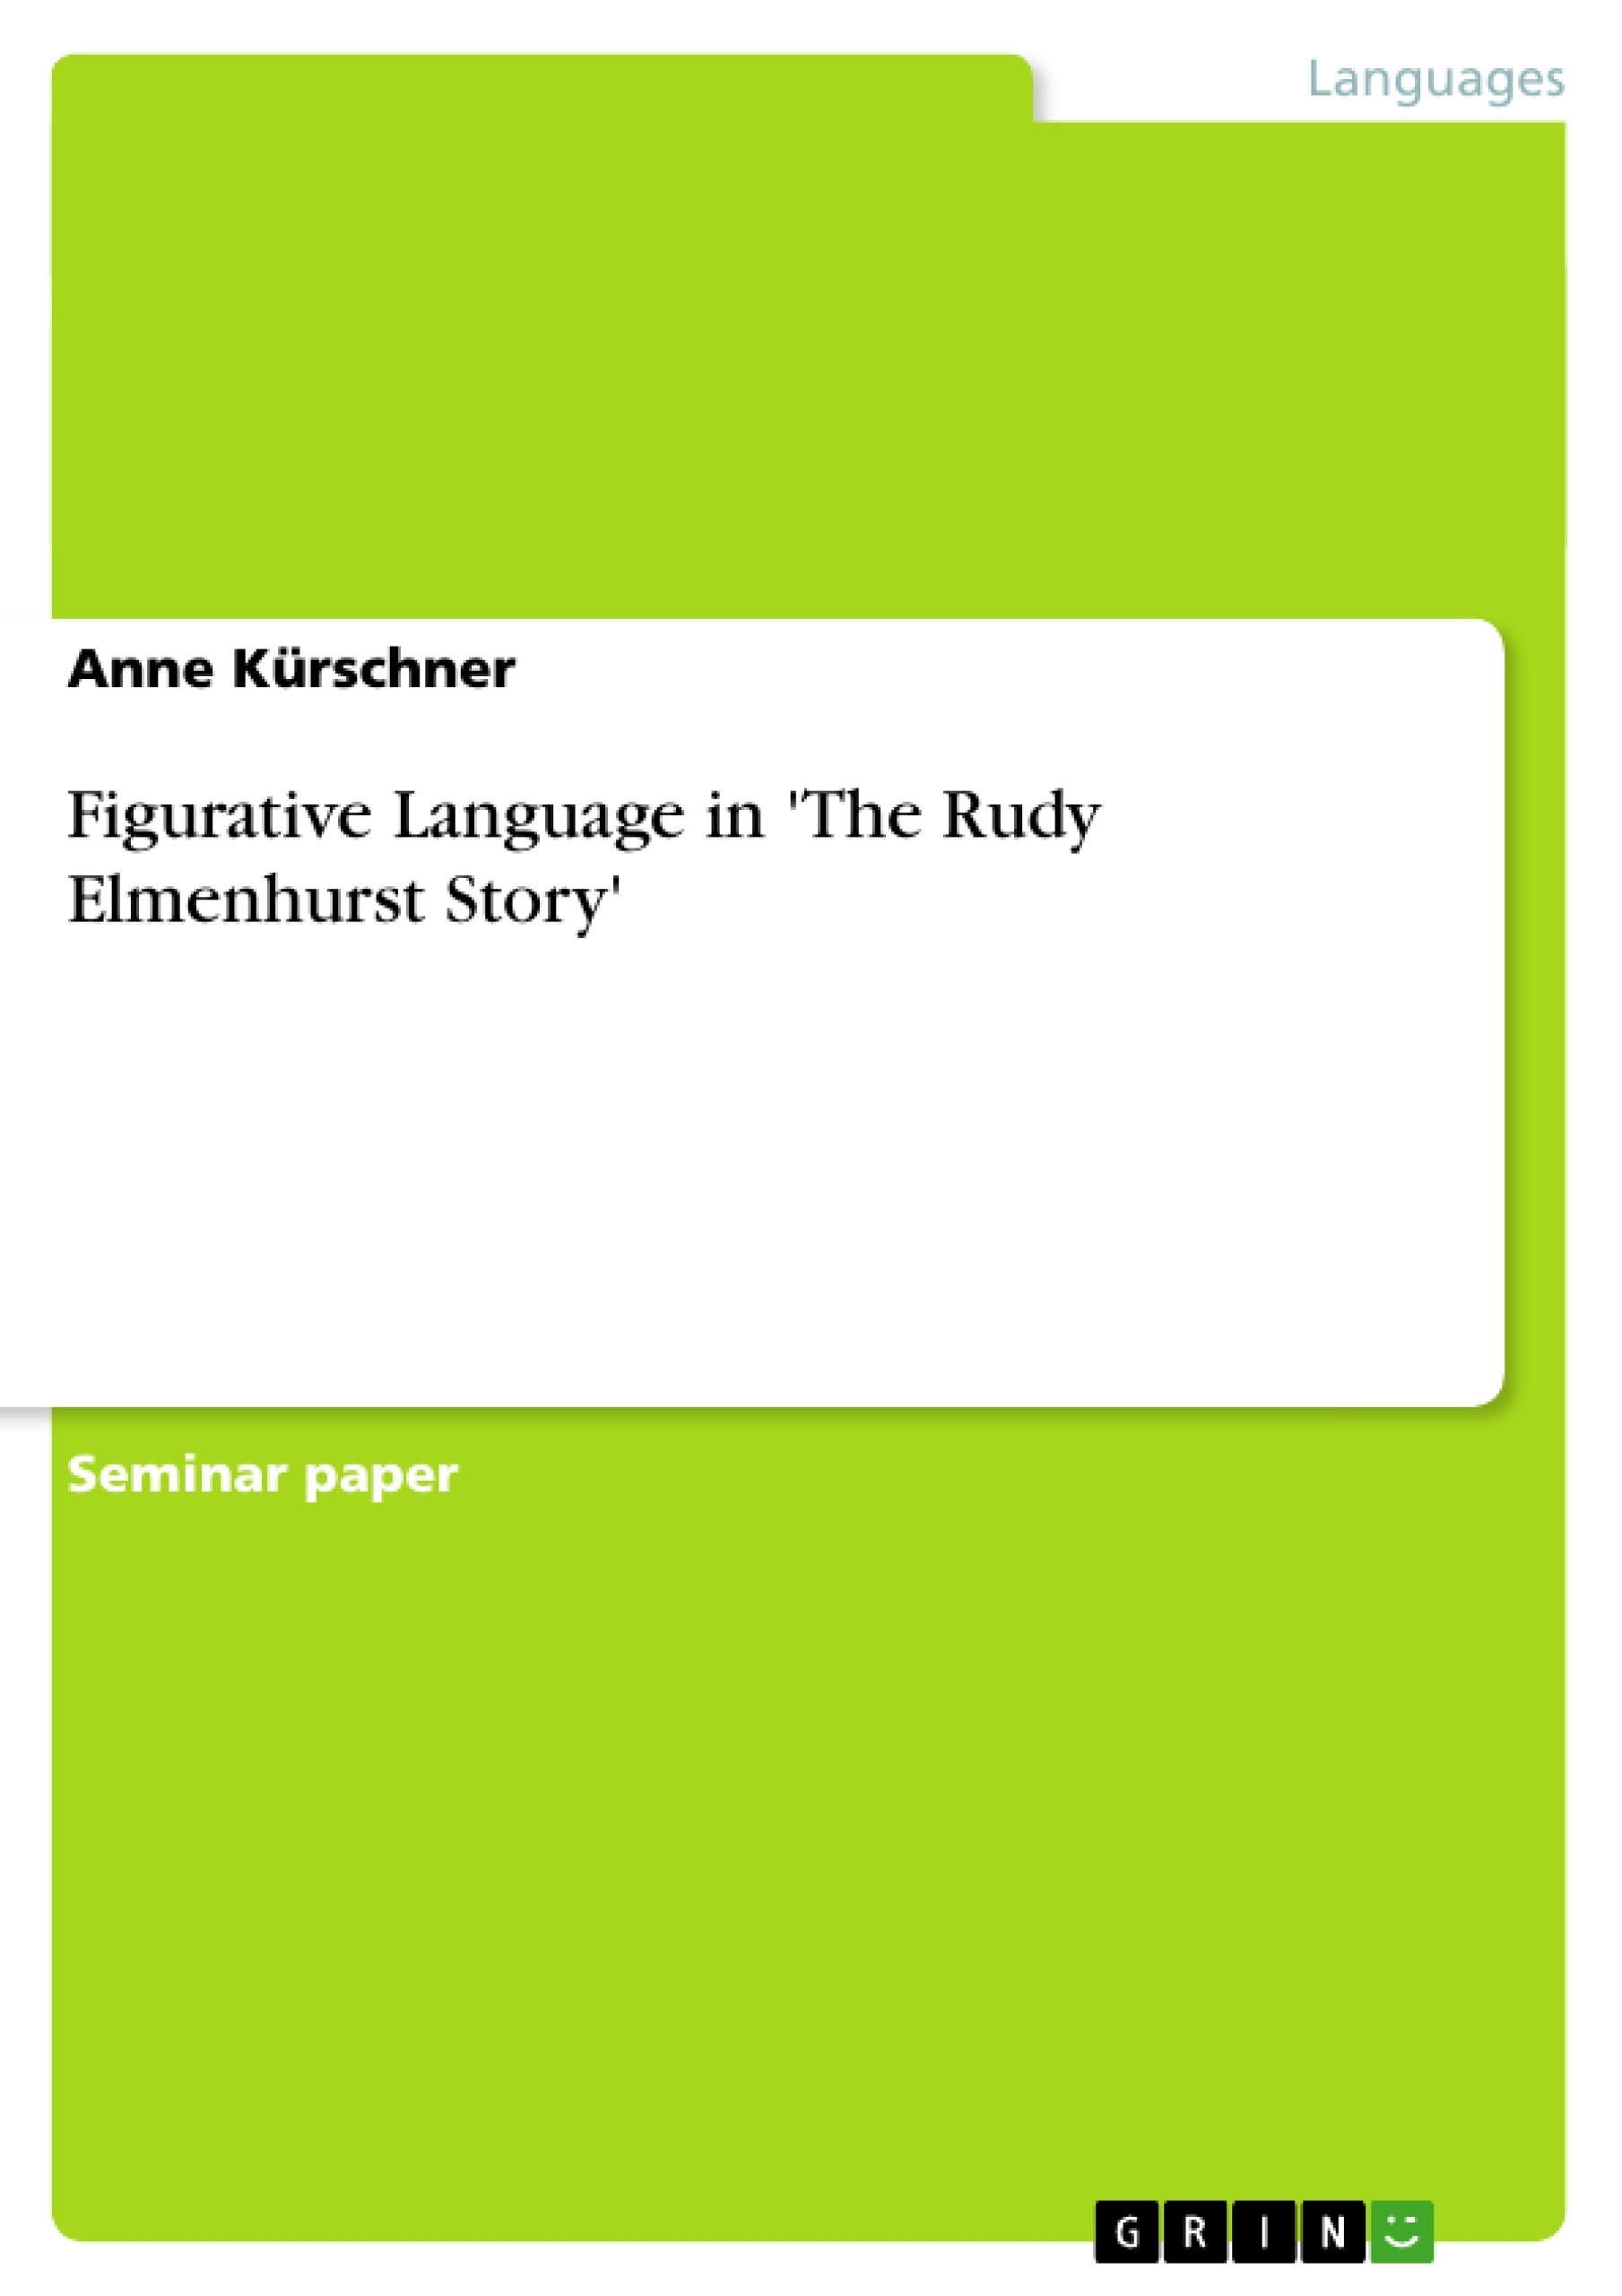 Title: Figurative Language in 'The Rudy Elmenhurst Story'